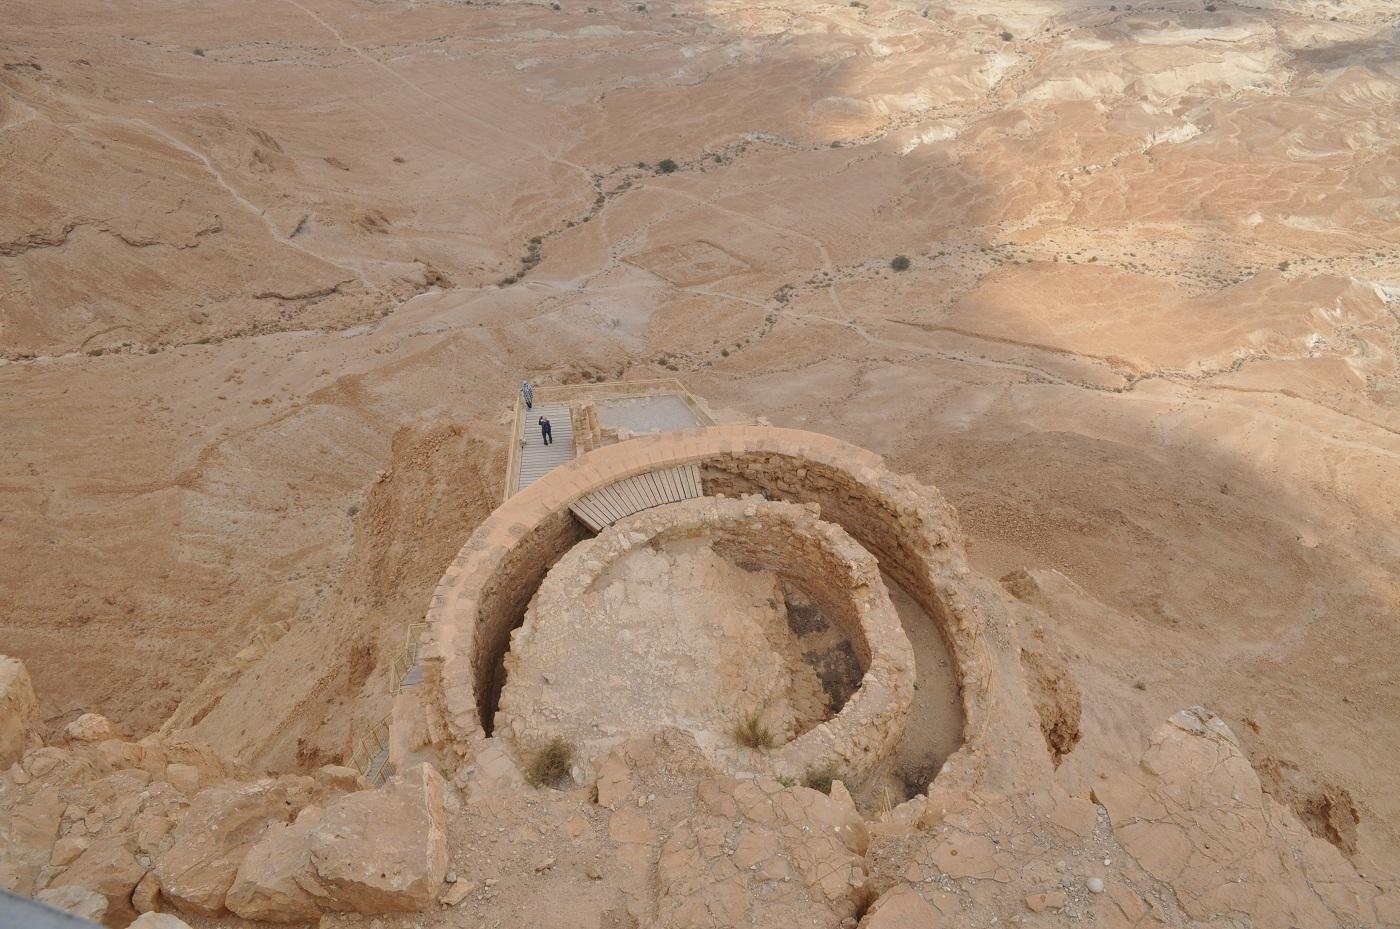 rocaille-blog-israel-dead-sea-masada-4